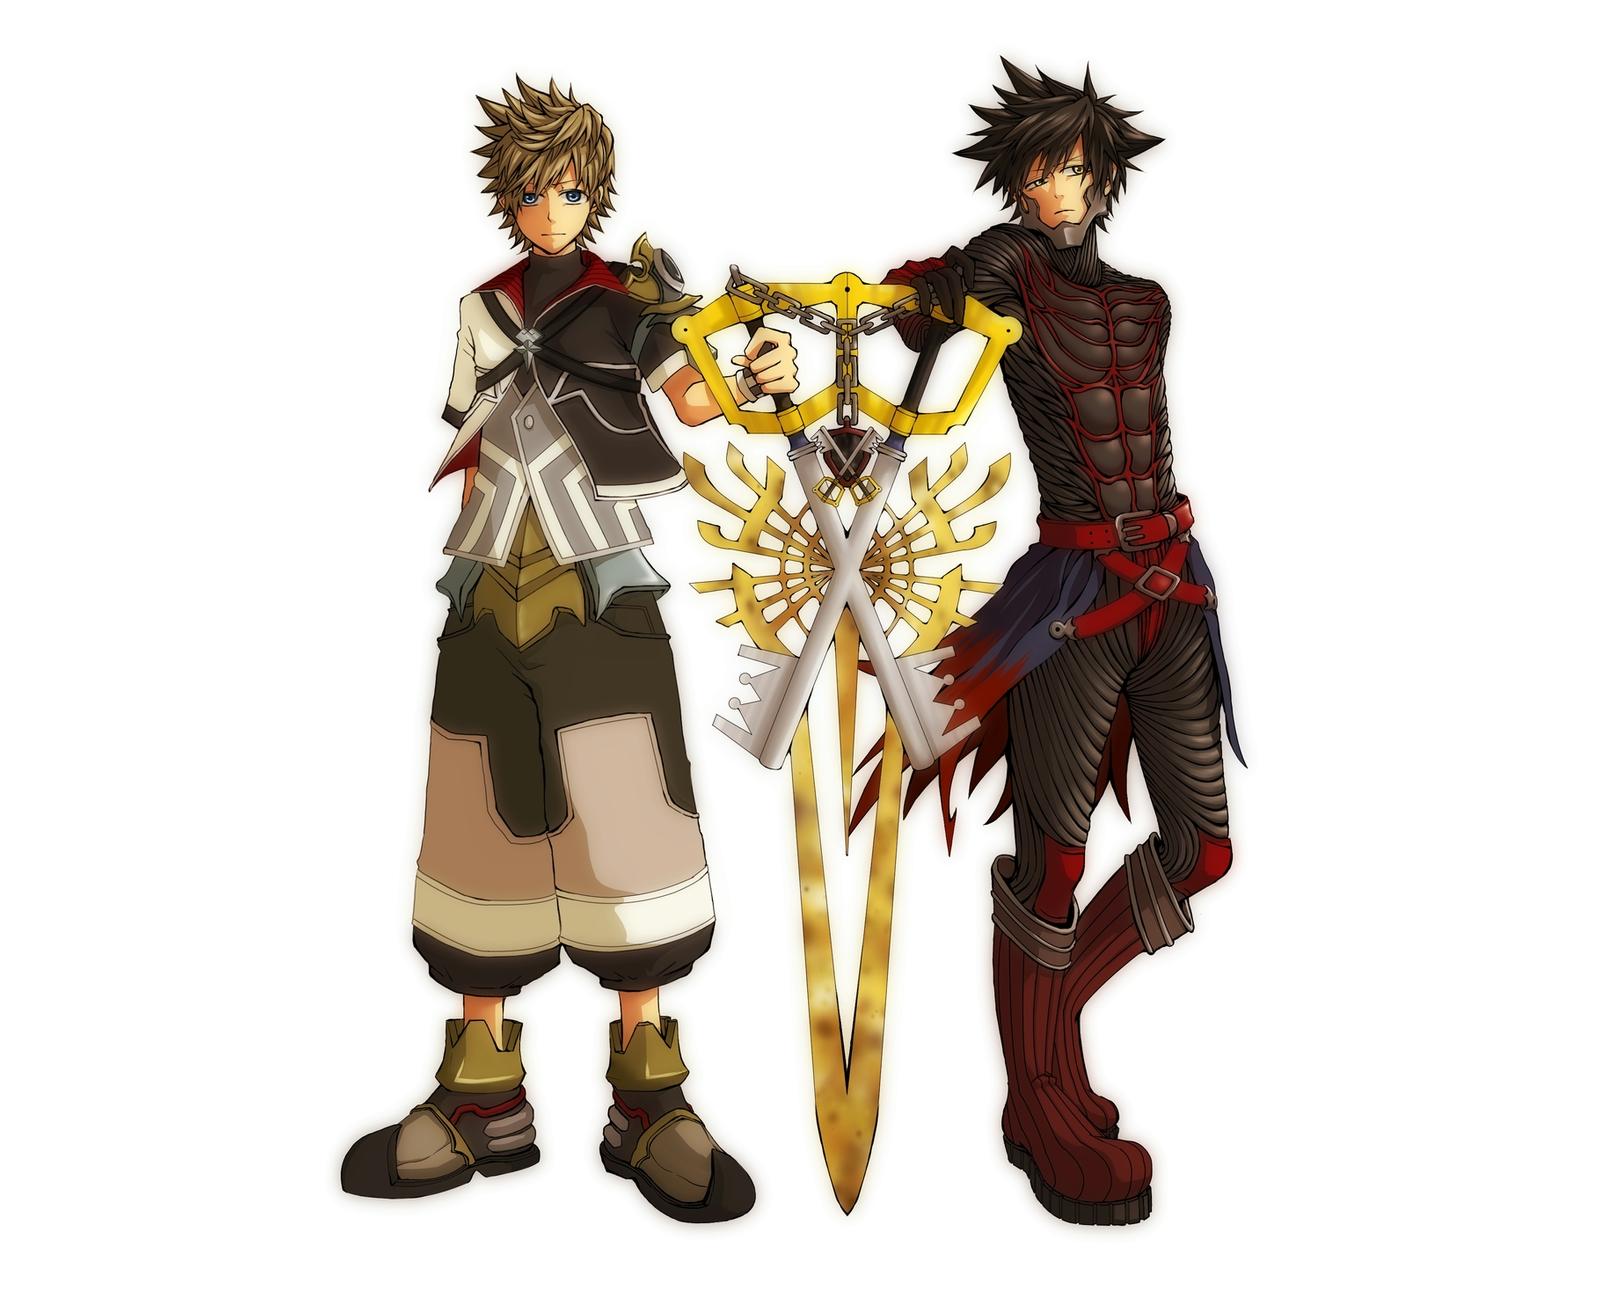 Kingdom Hearts Birth By Sleep Wallpaper - WallpaperSafari Kingdom Hearts Birth By Sleep Armor Wallpaper